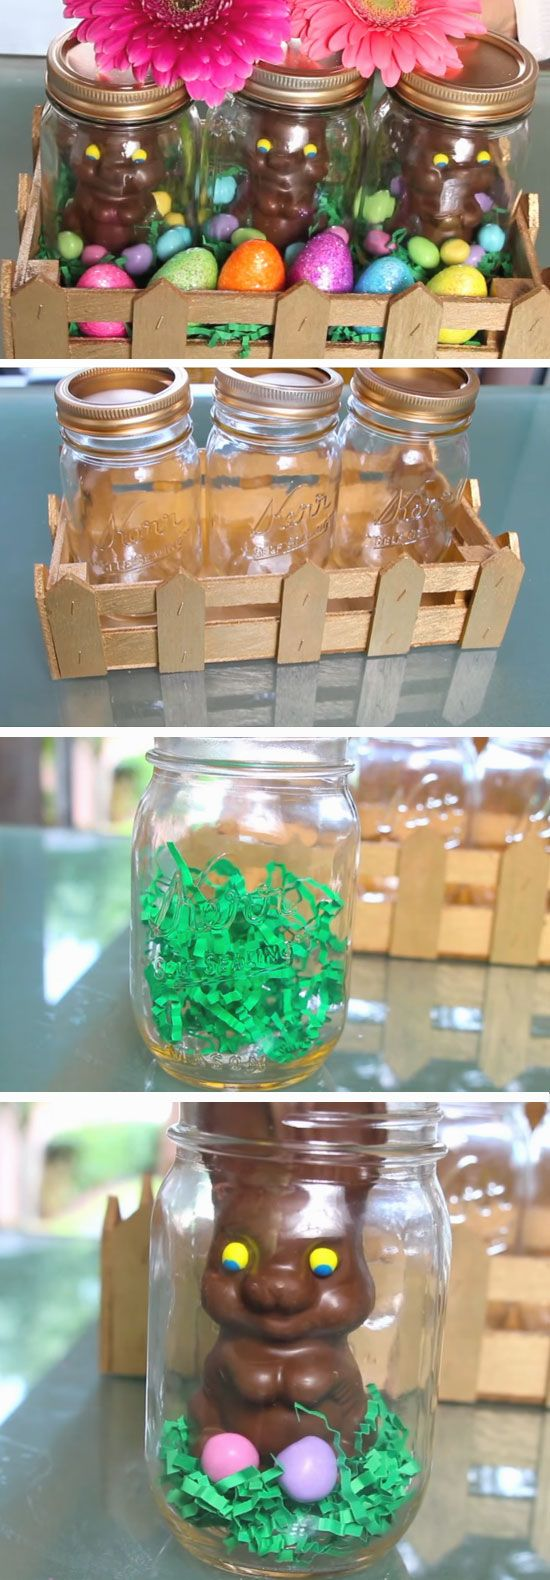 Ms de 25 ideas nicas sobre diy gifts easter en pinterest 17 easy diy easter basket ideas for teens negle Gallery